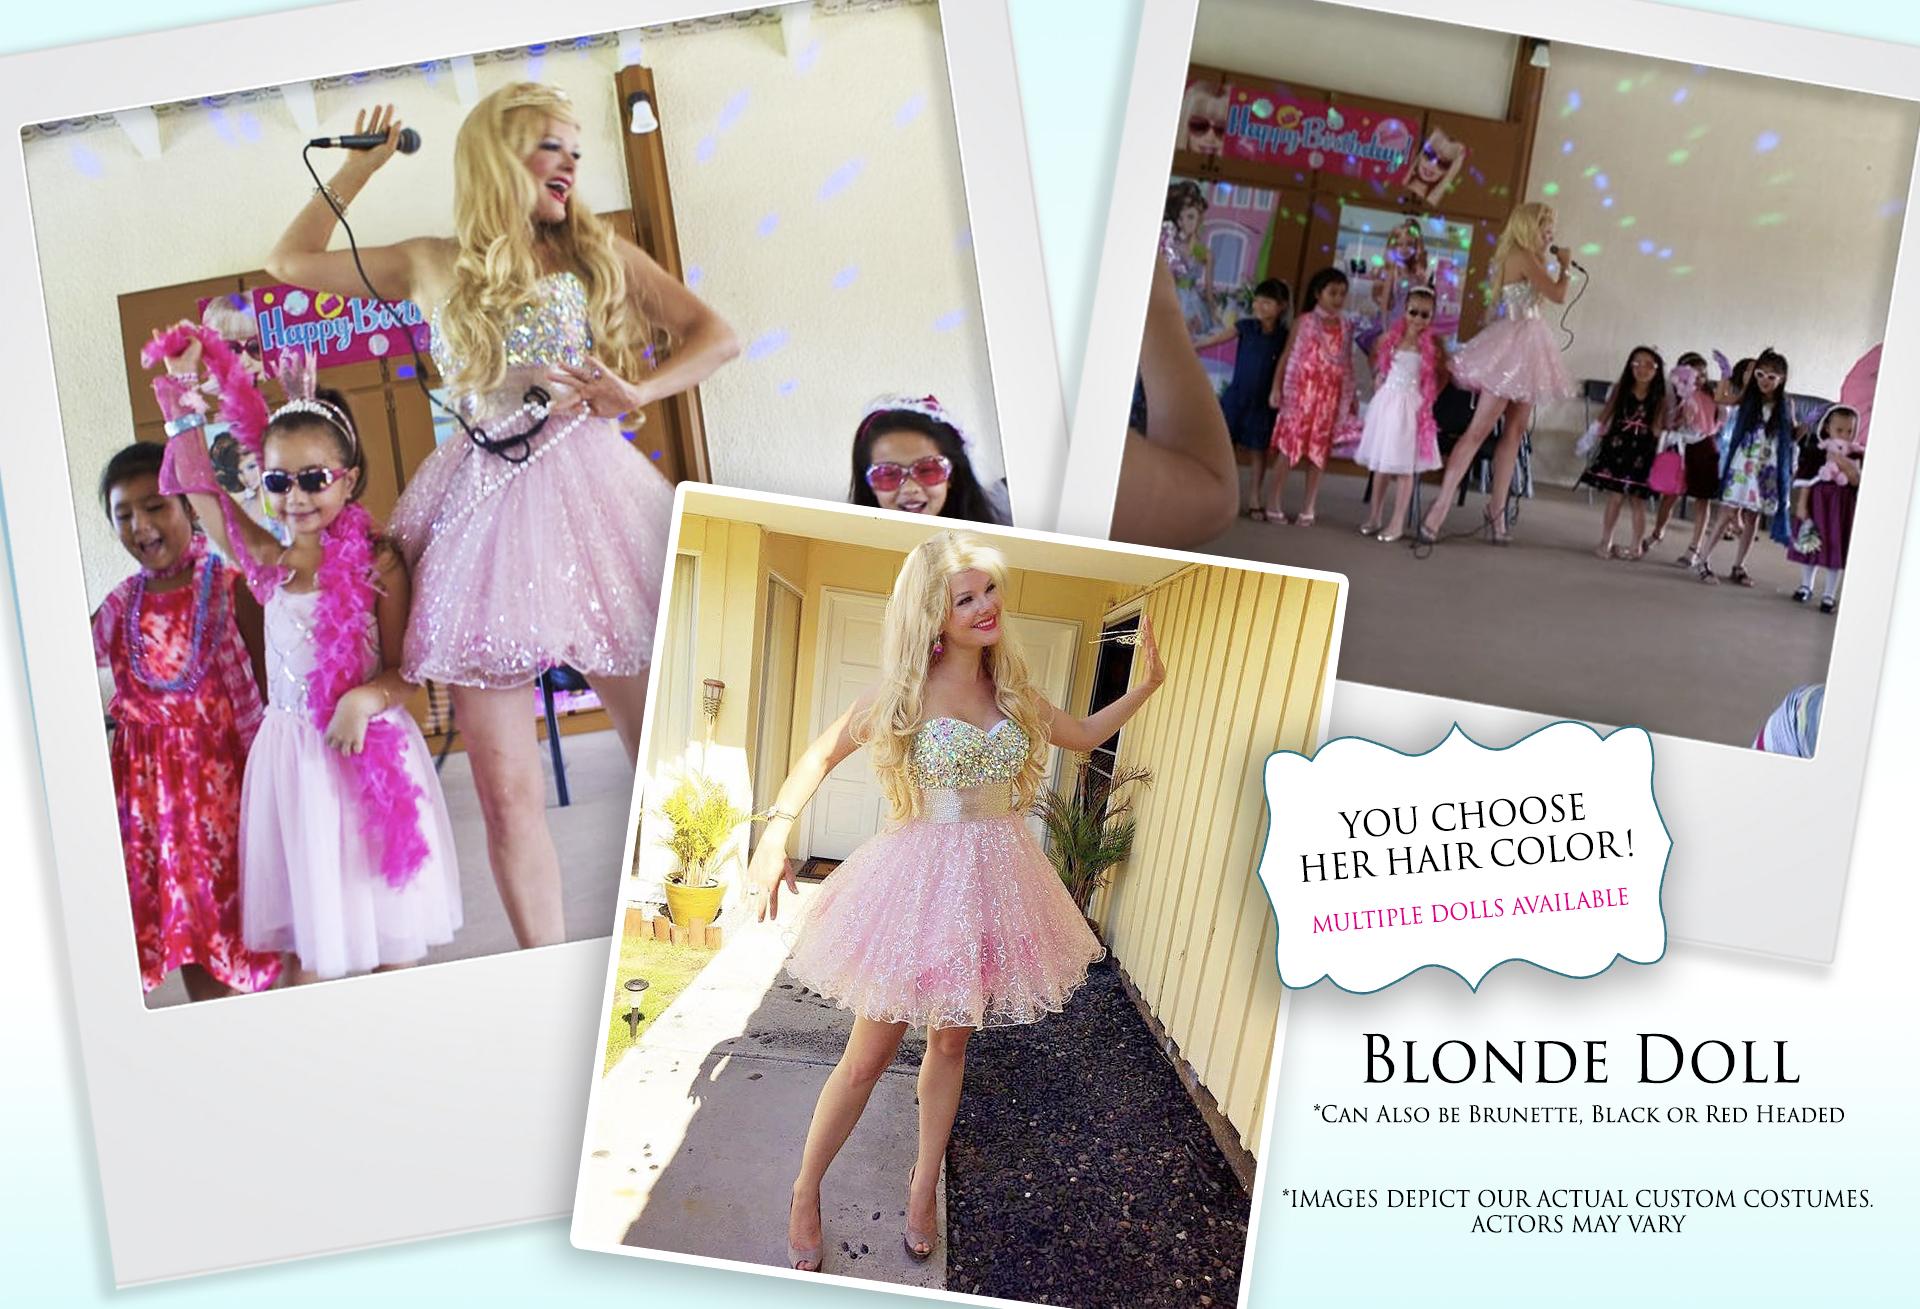 Blonde Doll